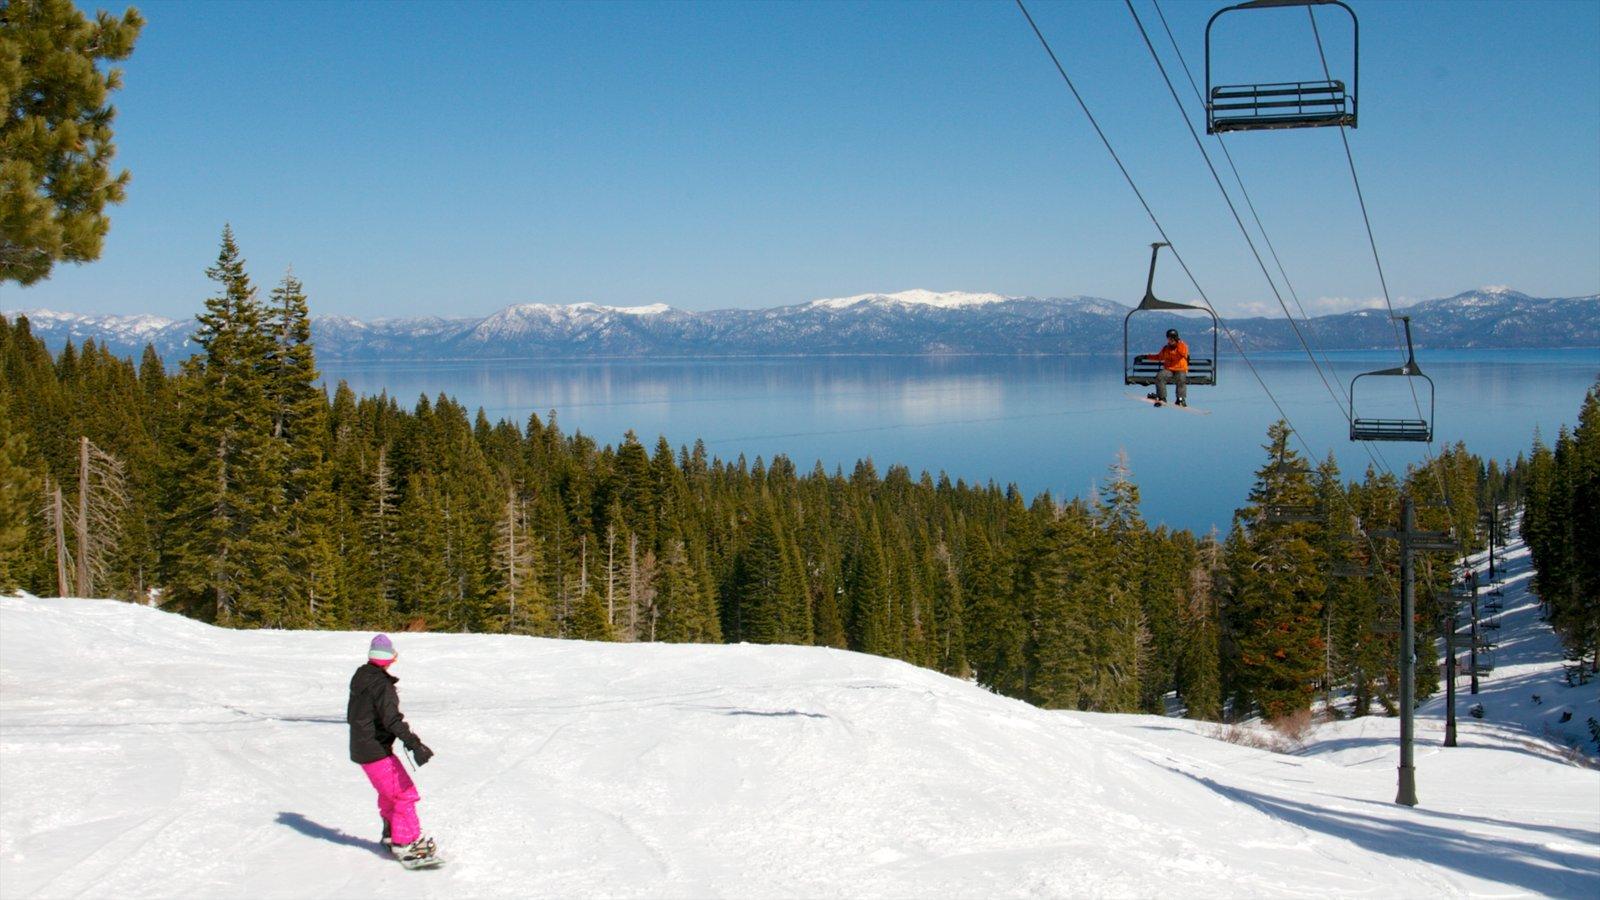 Homewood Mountain Resort caracterizando neve, esqui na neve e montanhas